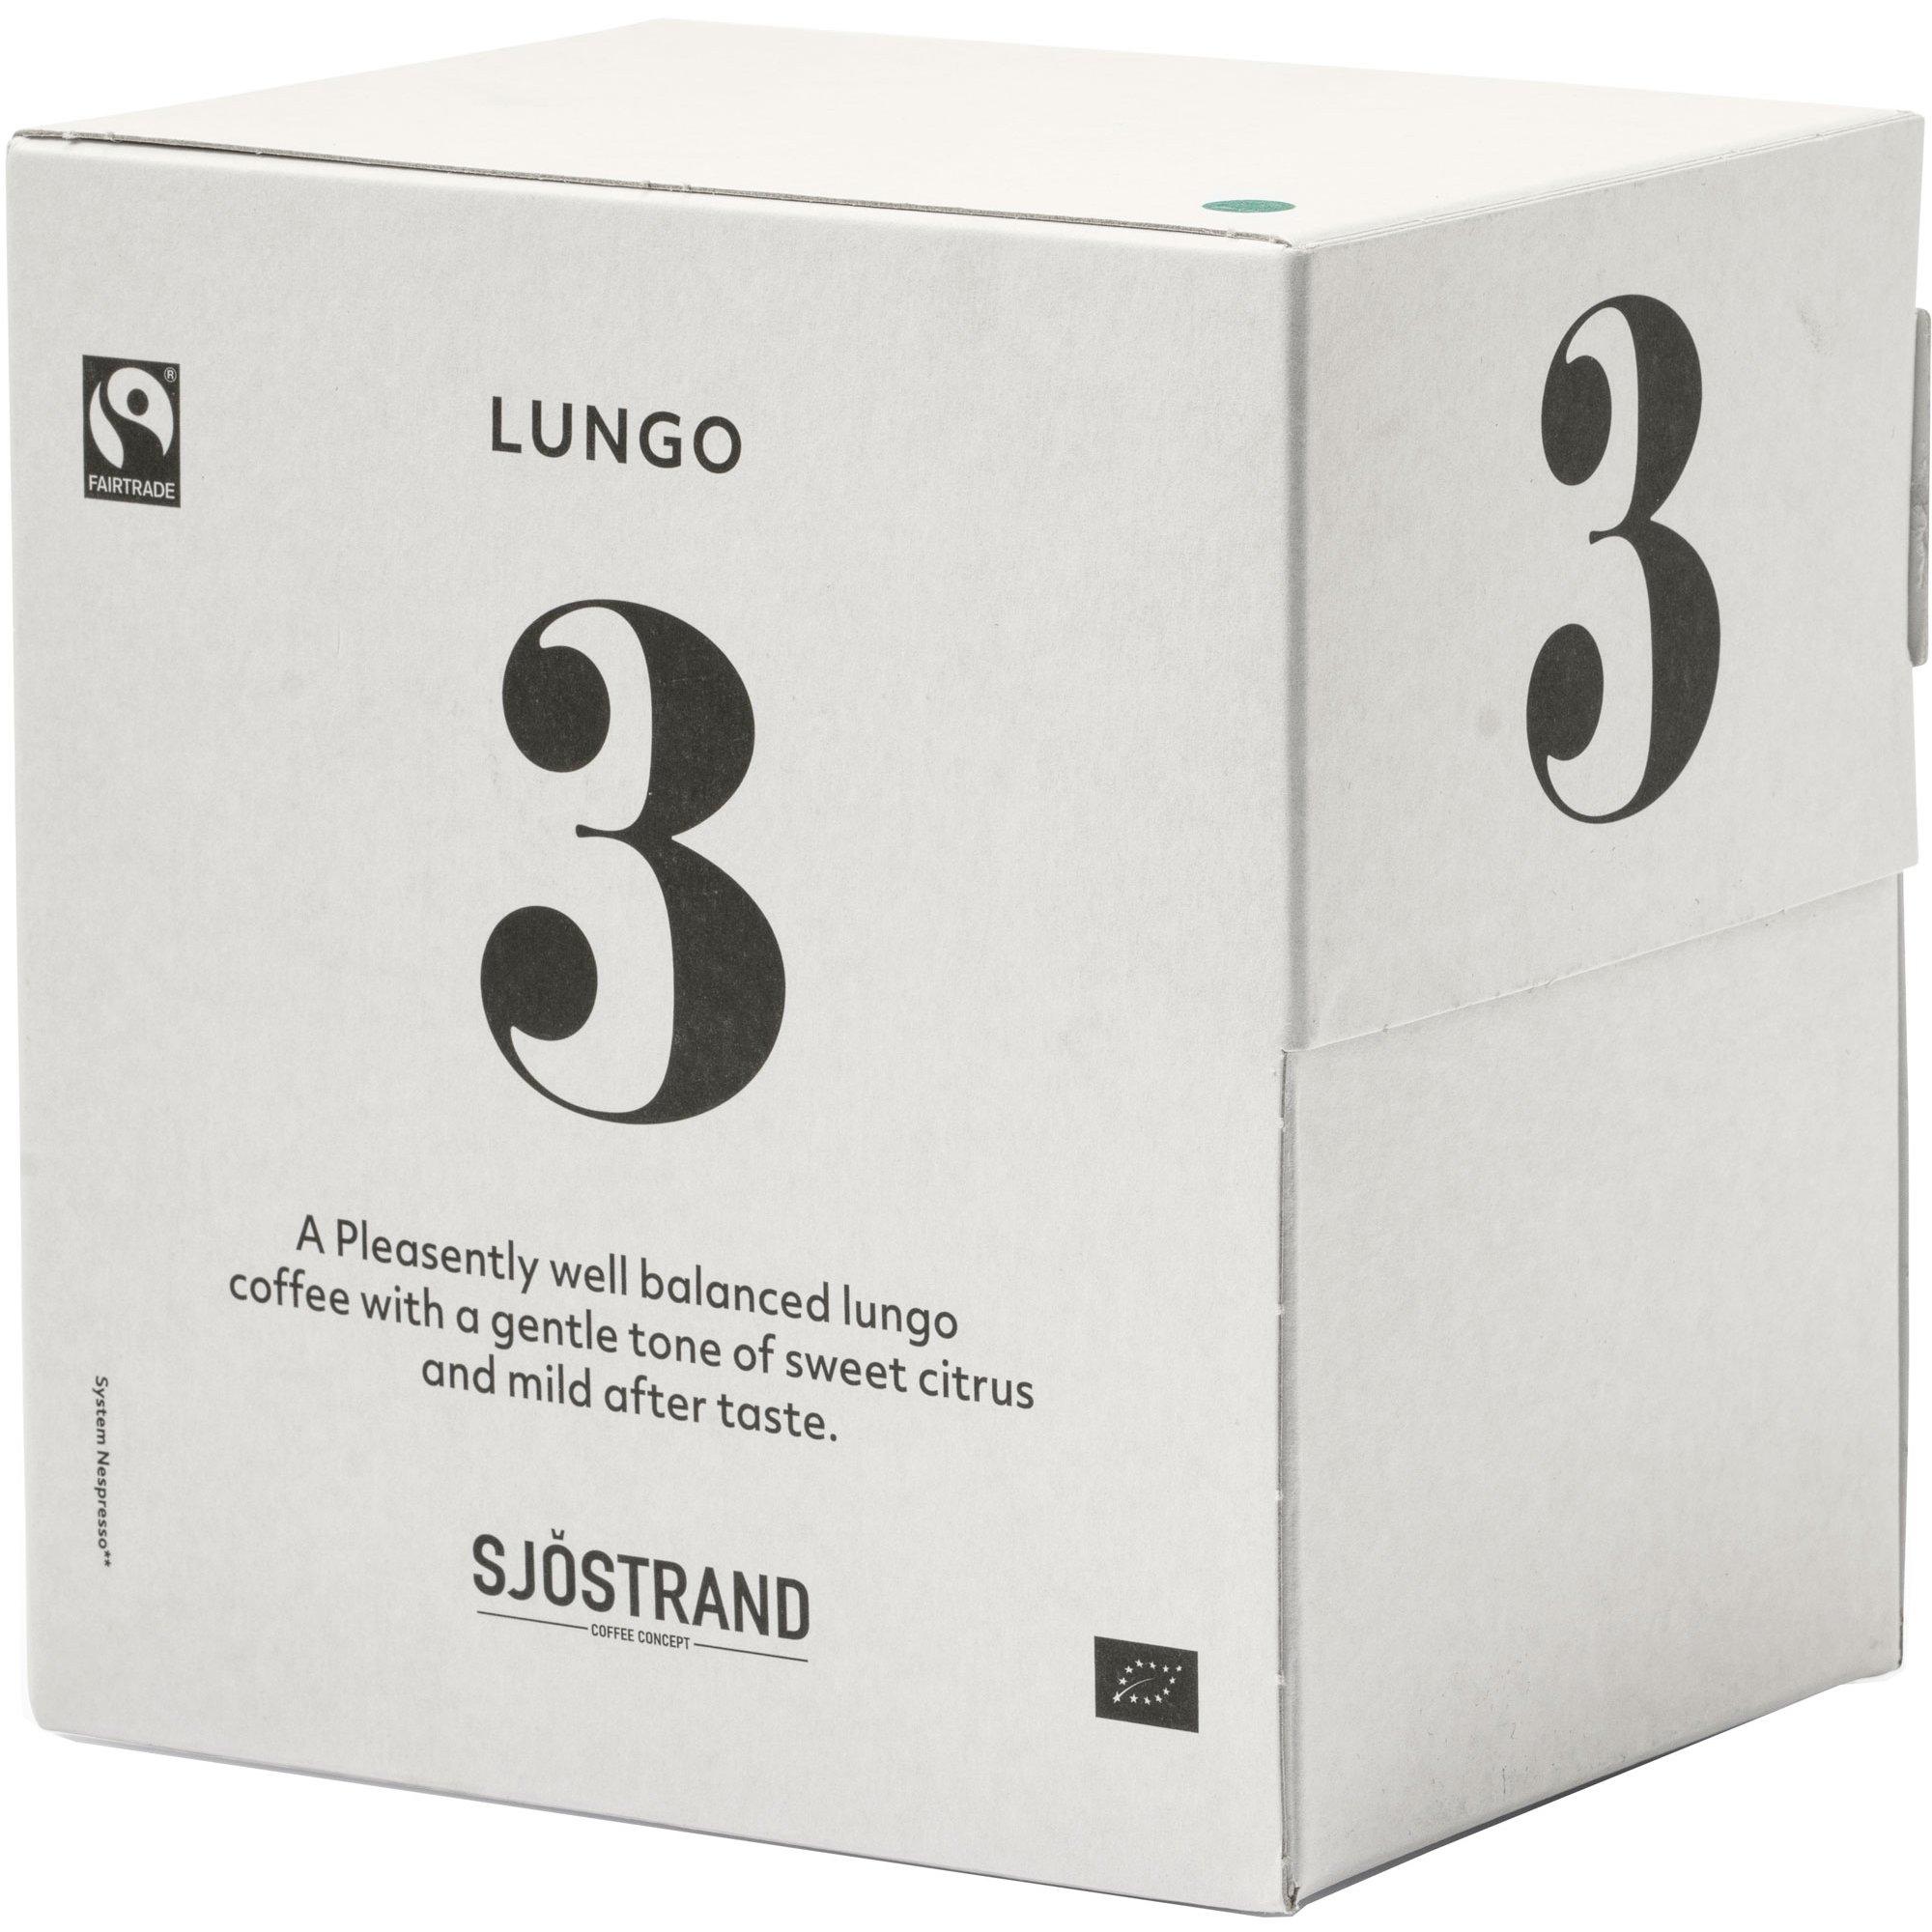 Sjöstrand Sjöstrand N°3 Lungo Kapslar 100-pack